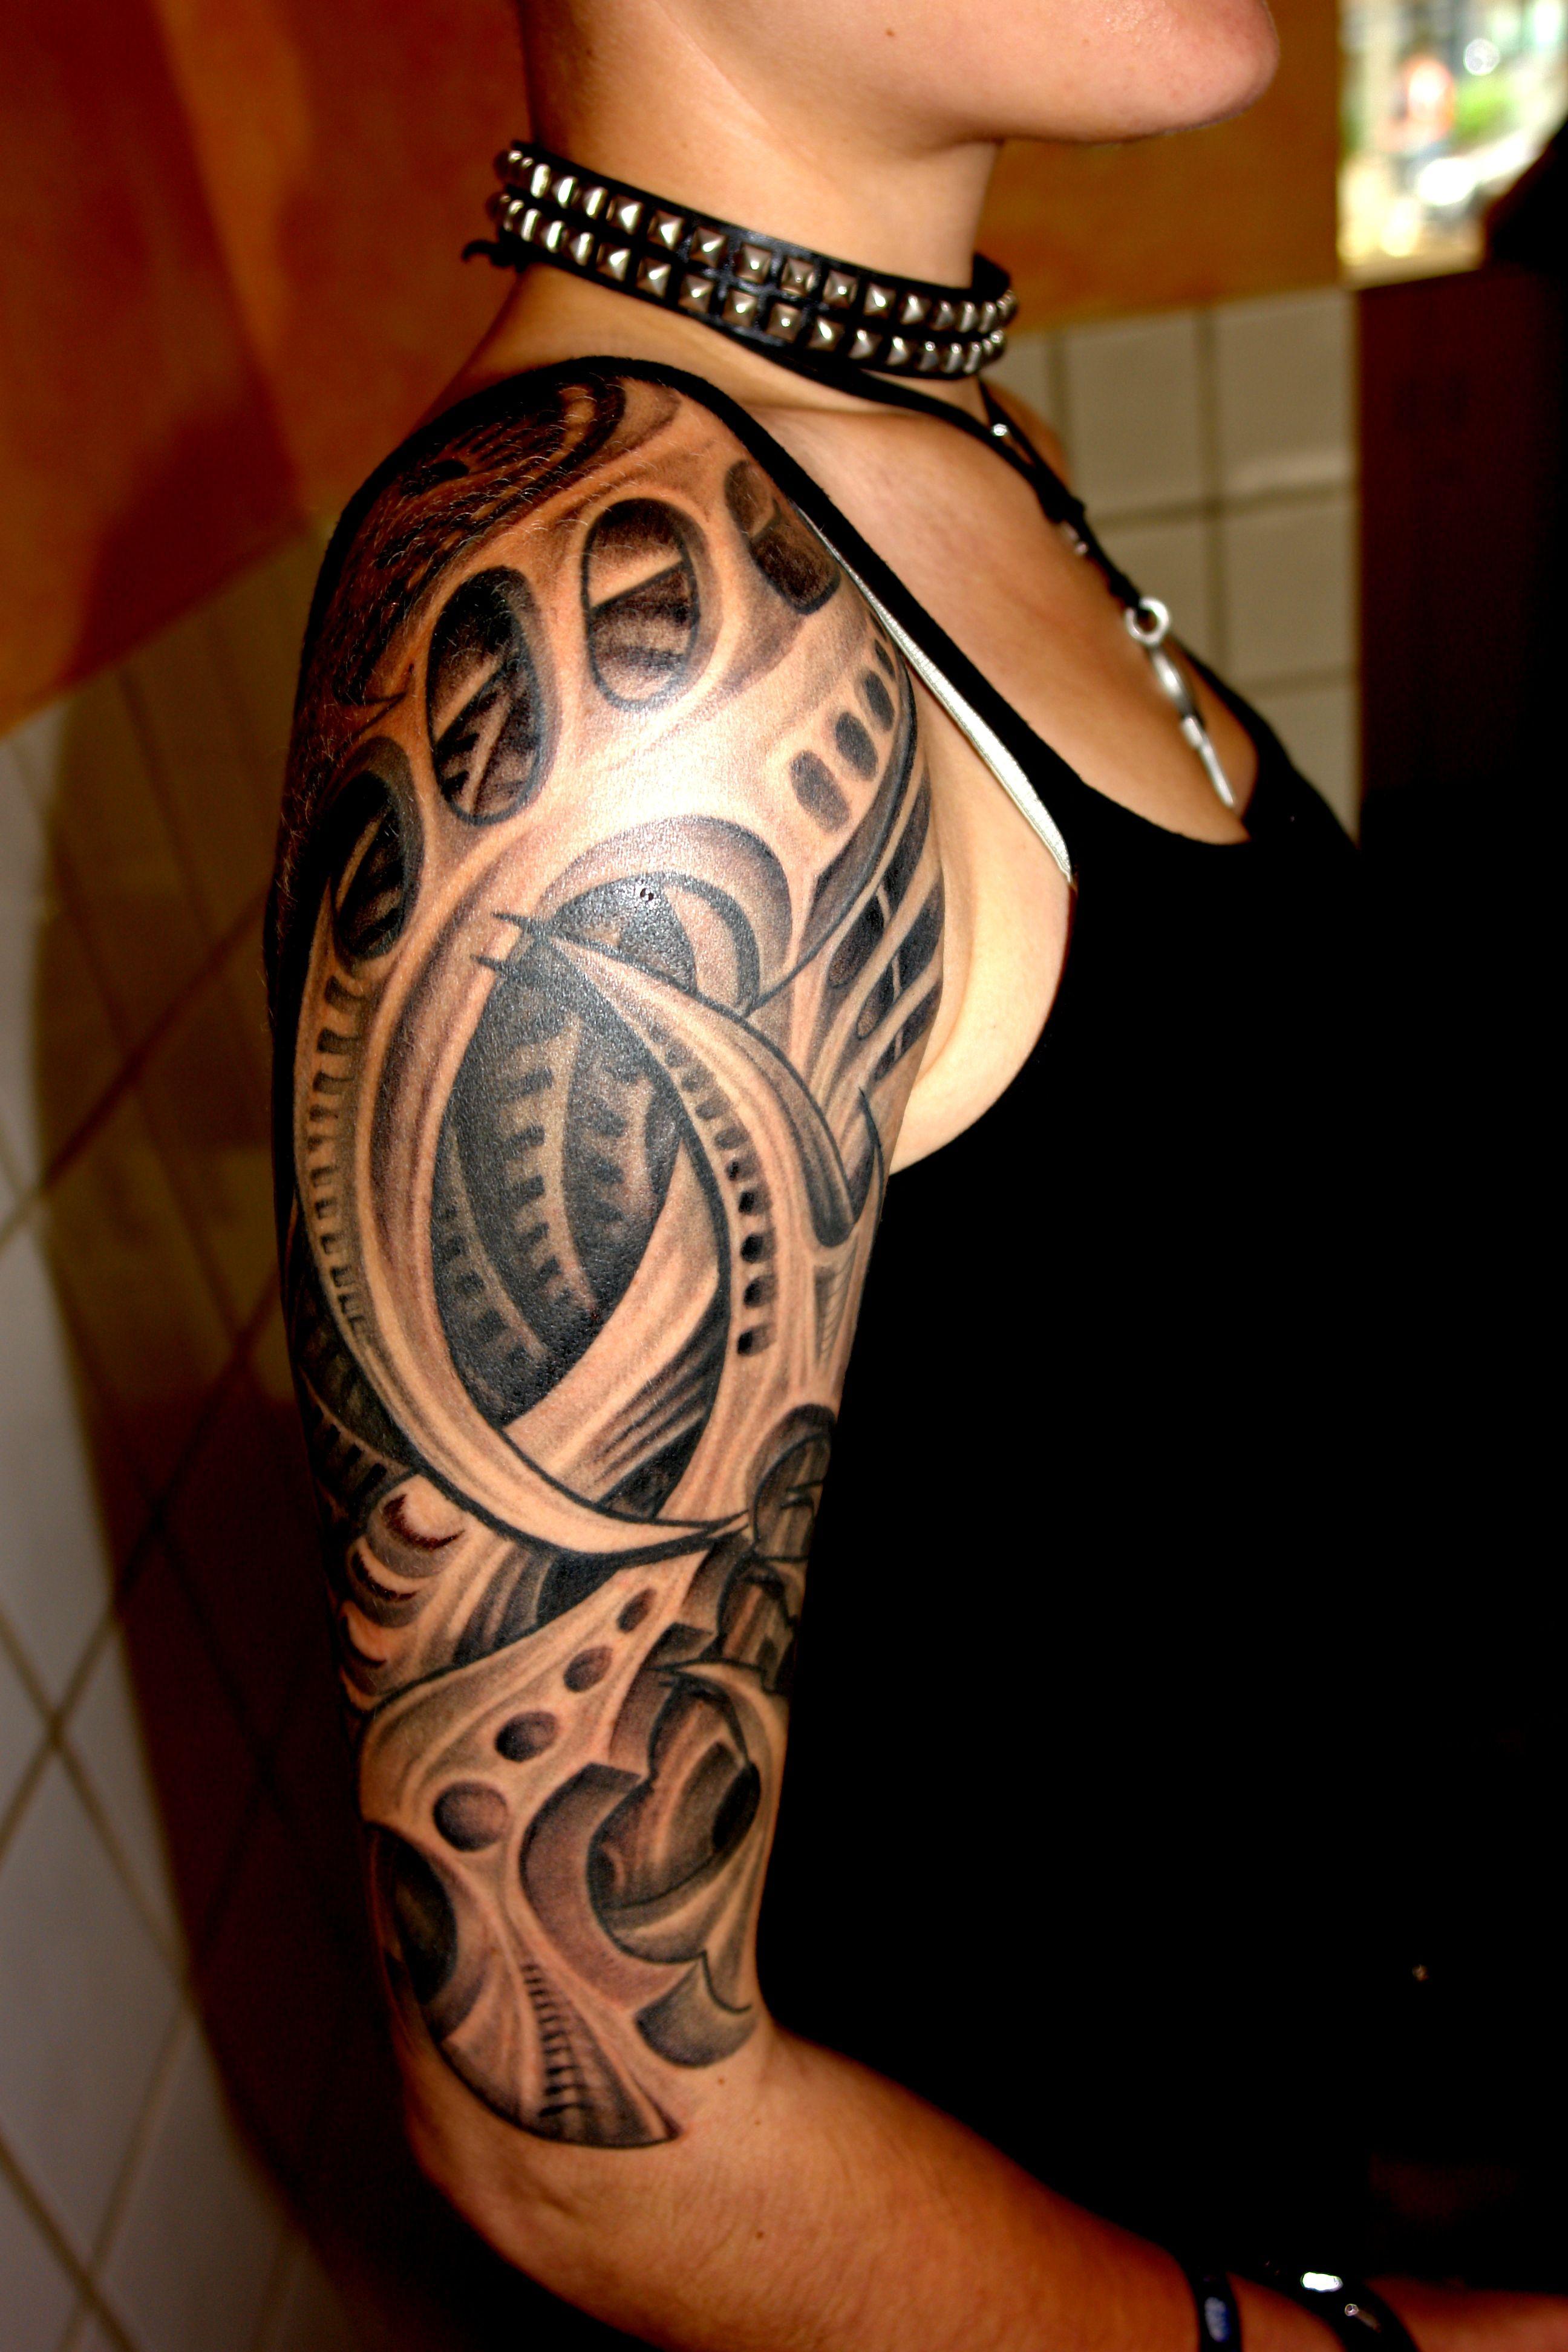 olli tattooer culture shocks visual caravan of. Black Bedroom Furniture Sets. Home Design Ideas